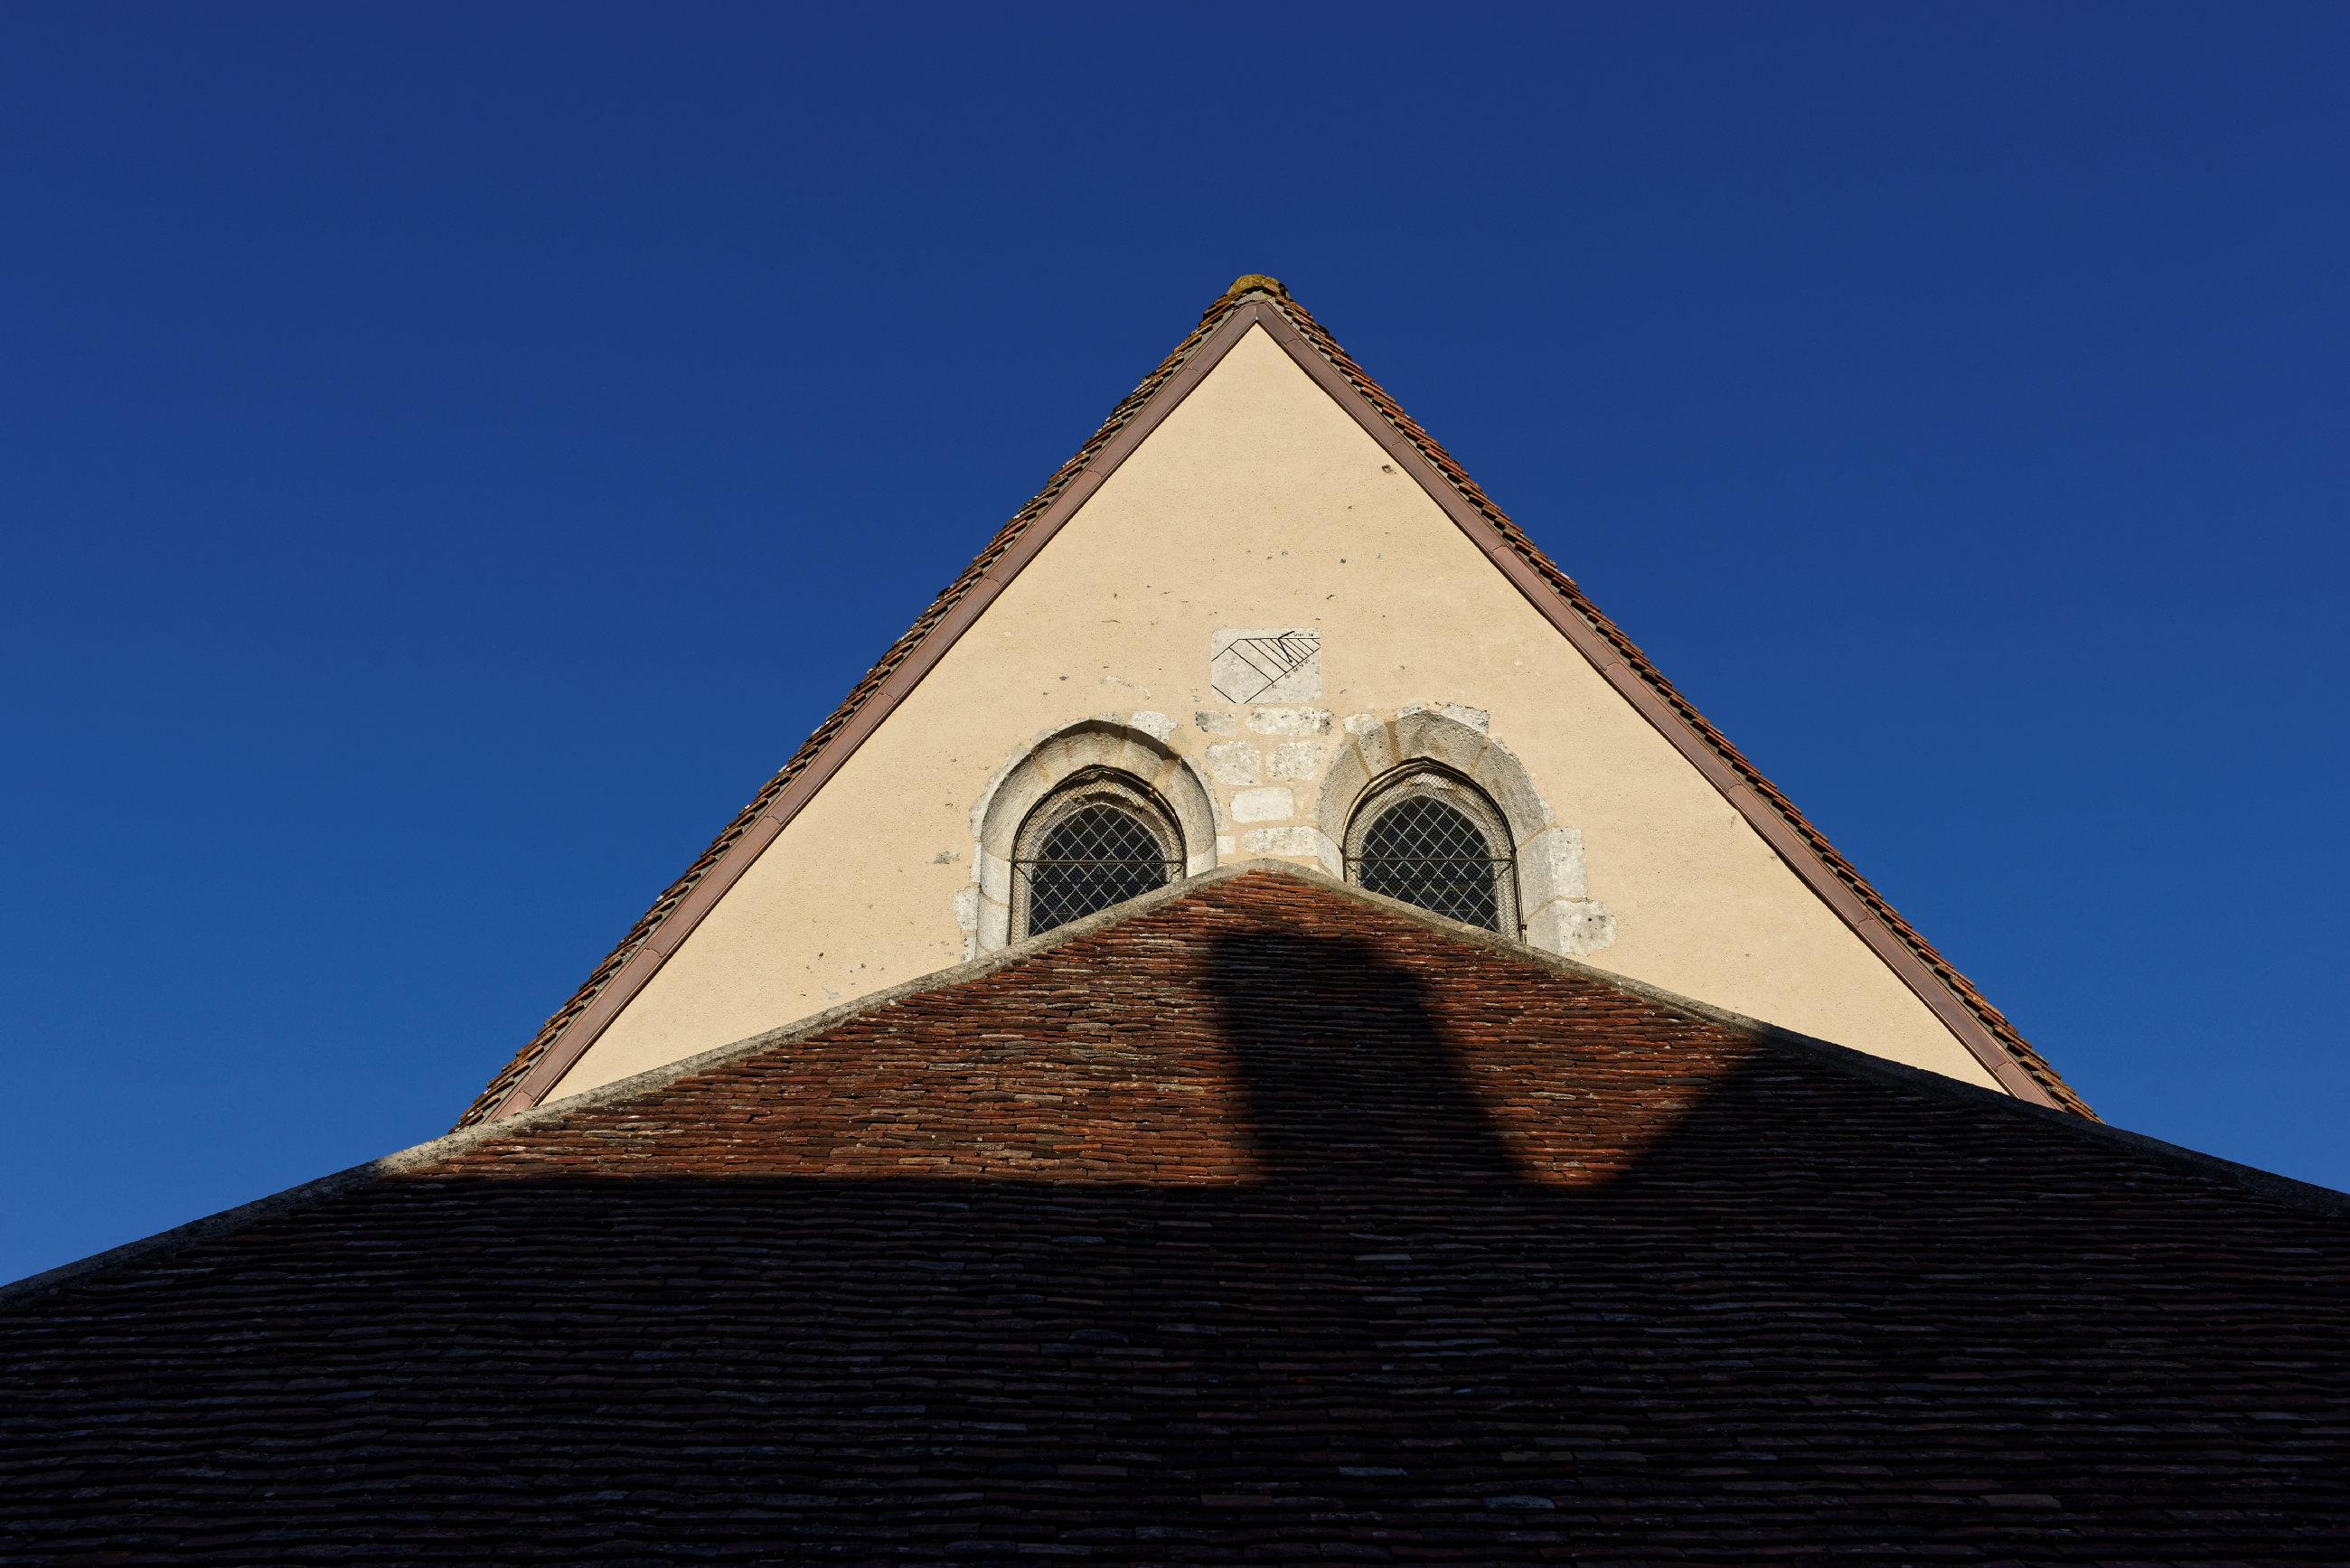 150405-Moutiers en Puisaye (28)